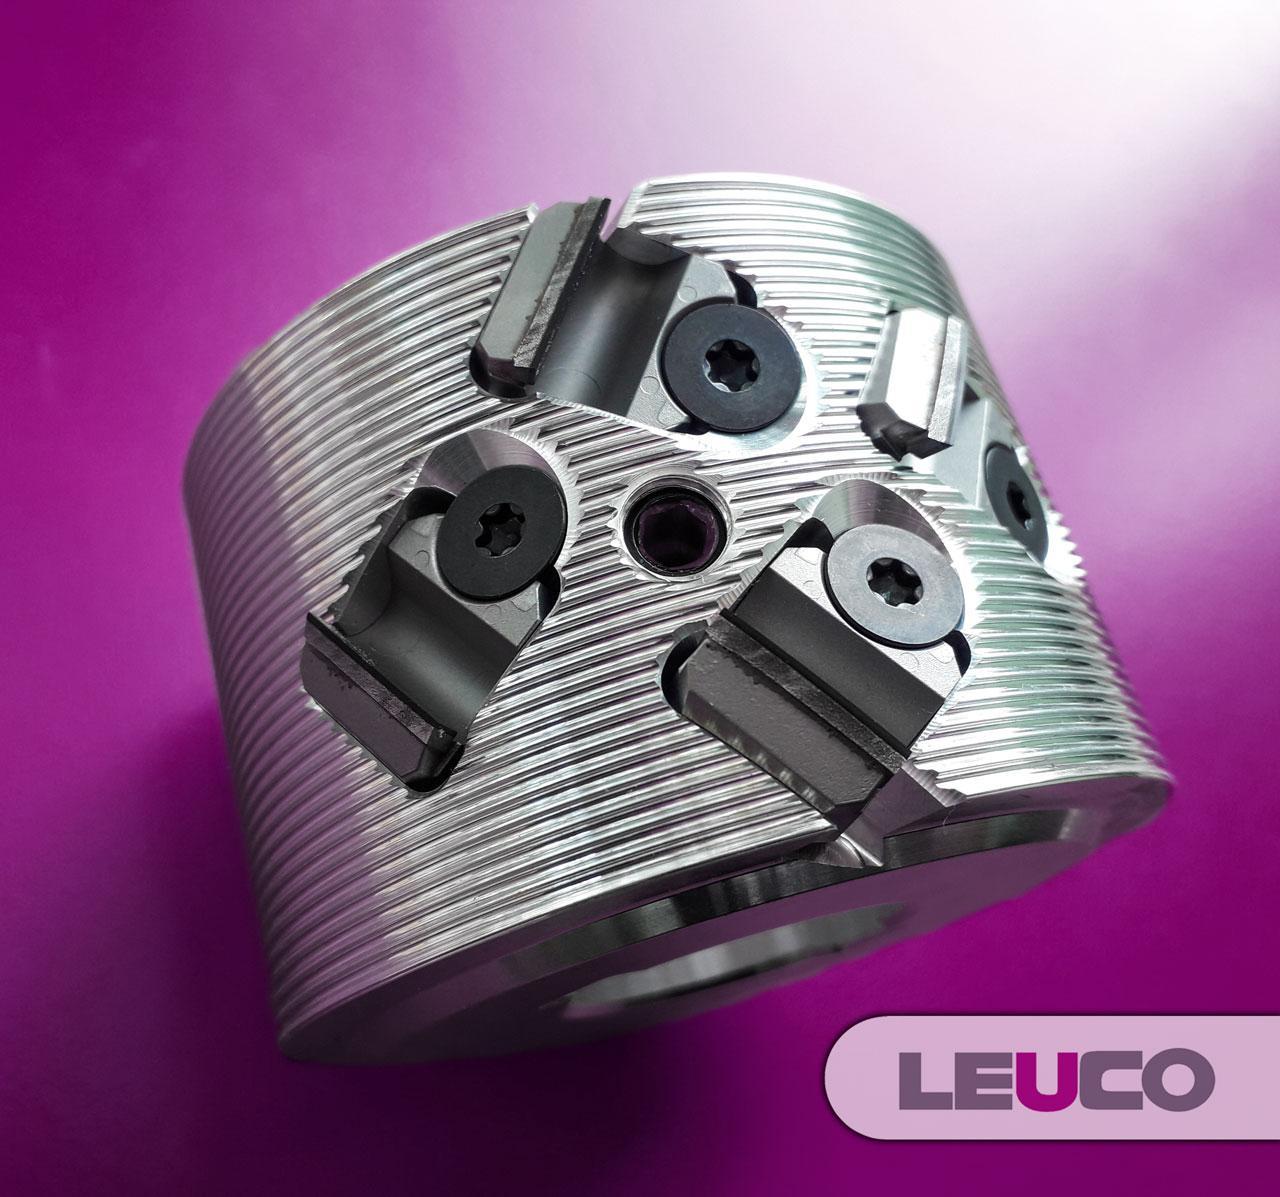 Алмазная фреза для прифуговки под кромку LEUCO DIAMAX SmartJointer airFace DP (для станков SCM ME-28, ME-35)